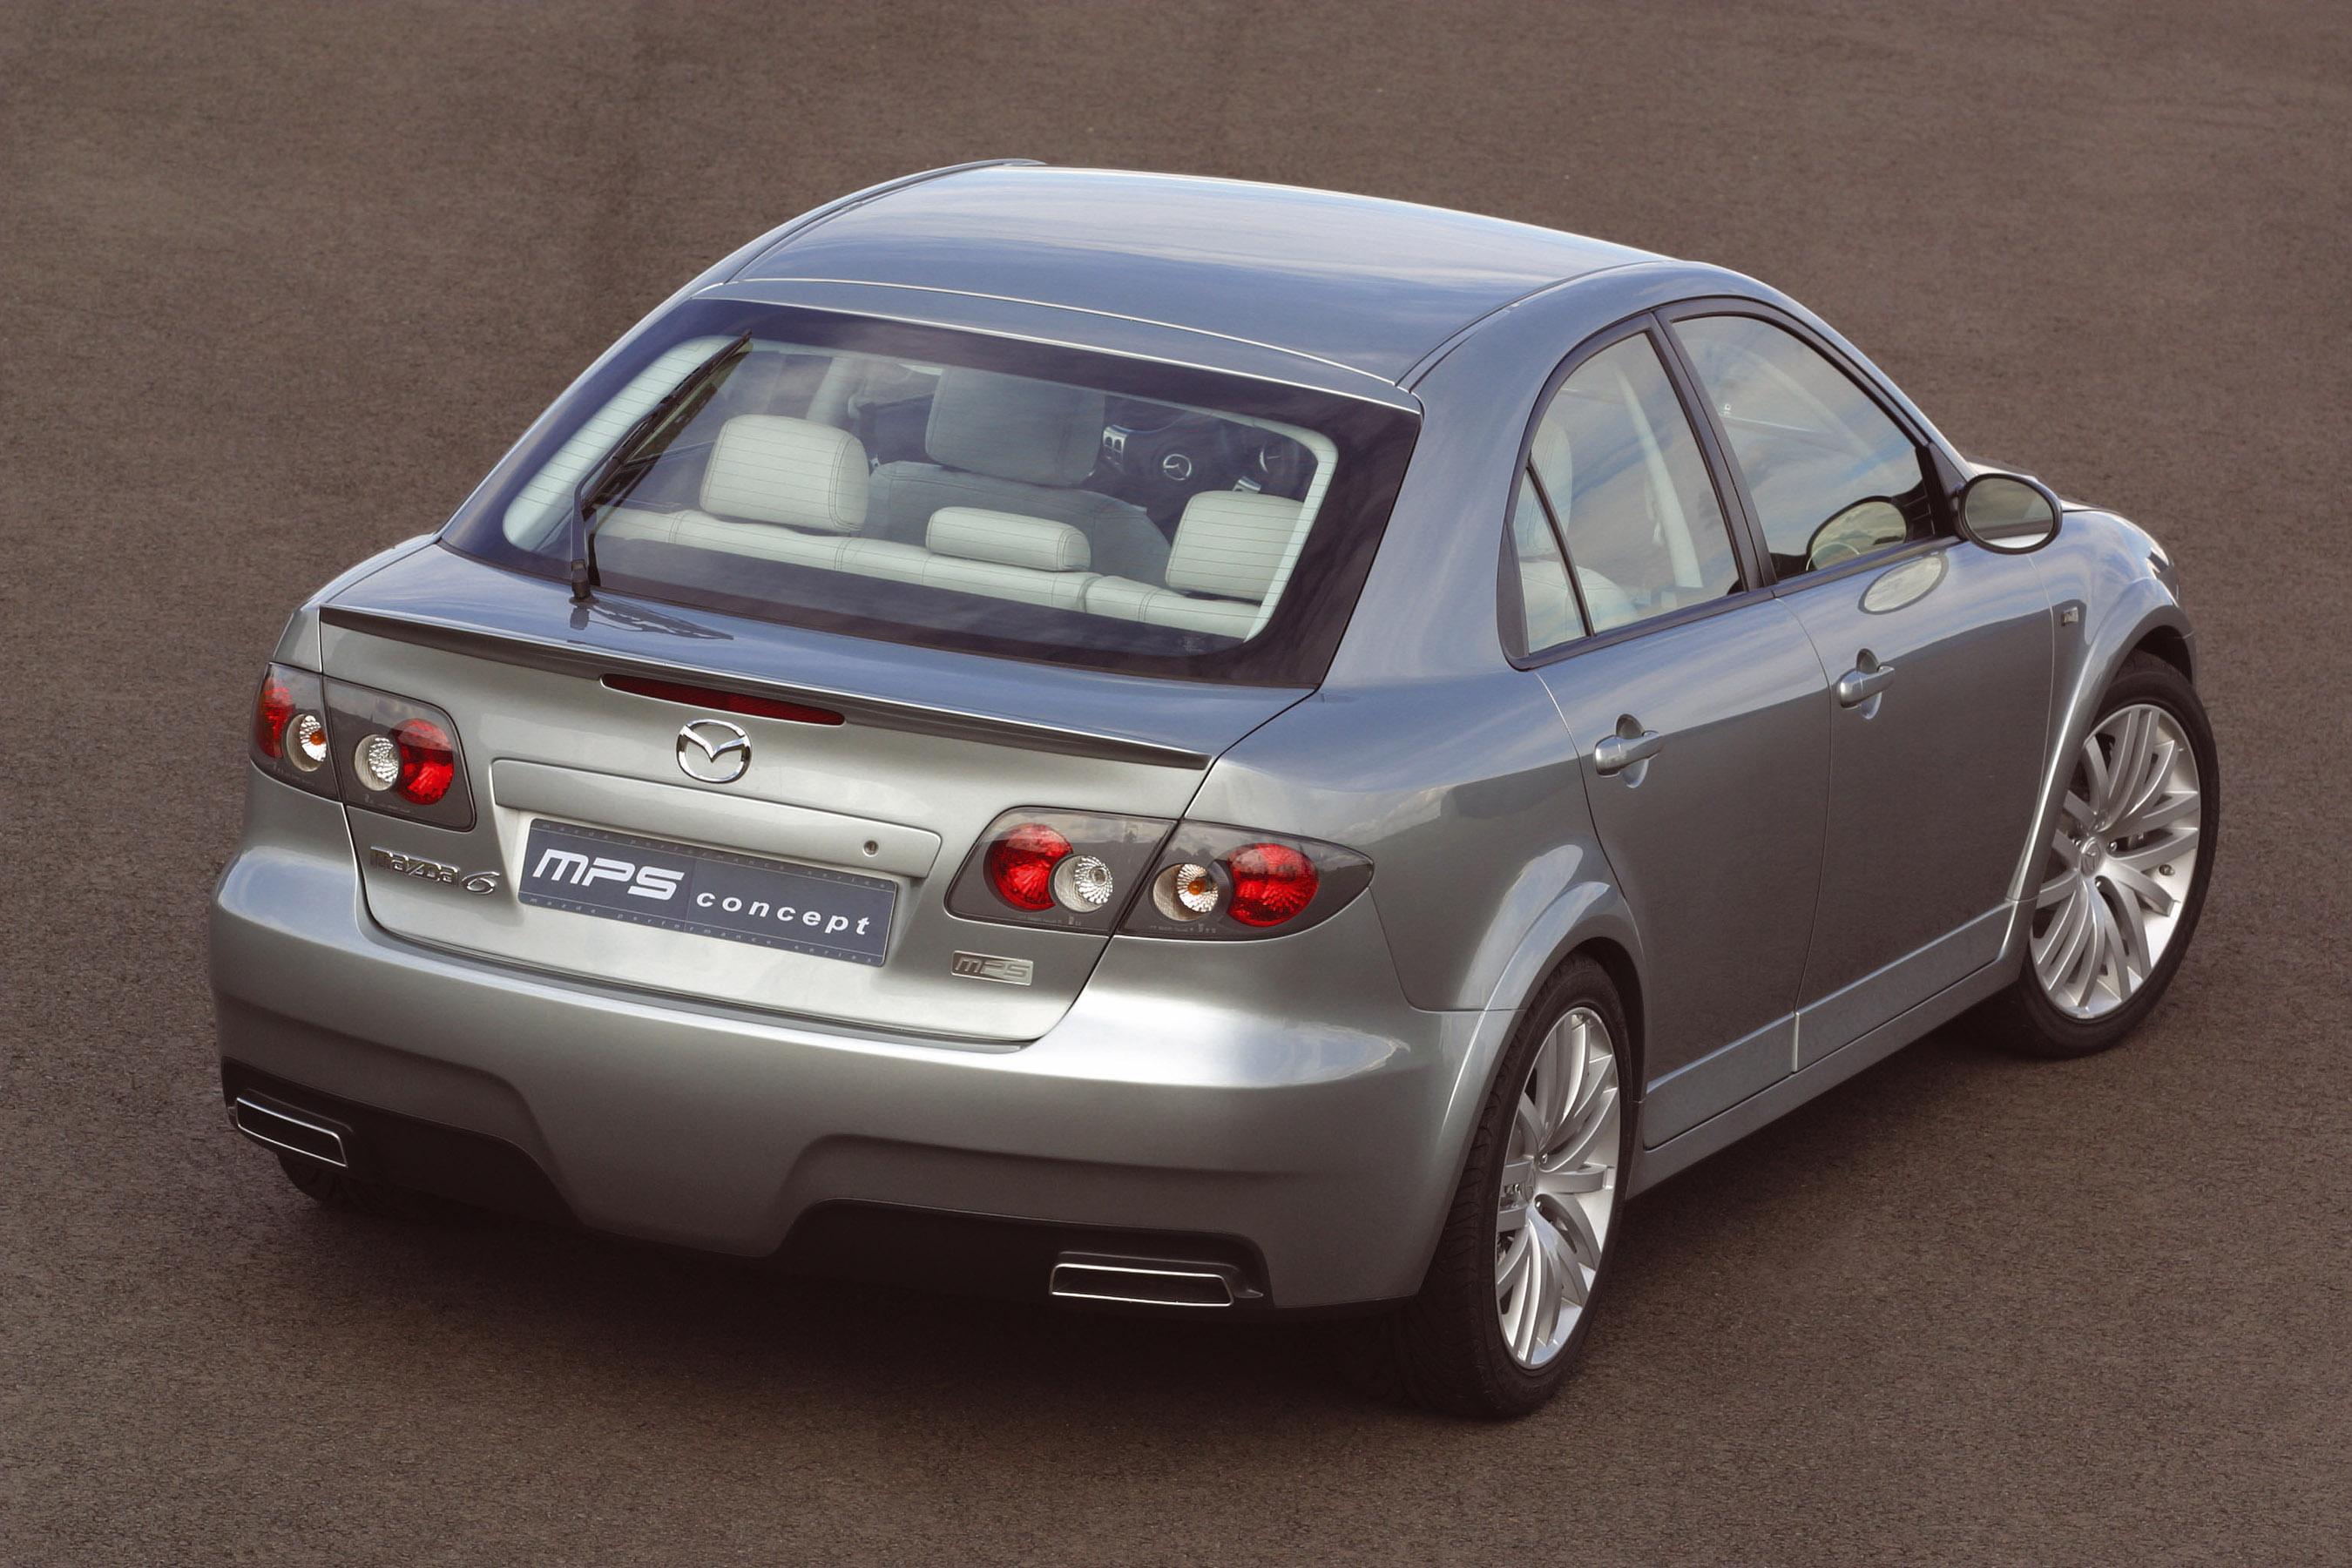 https://www.automobilesreview.com/gallery/2002-mazda-6-mps-concept/2002-mazda-6-mps-concept-08.jpg